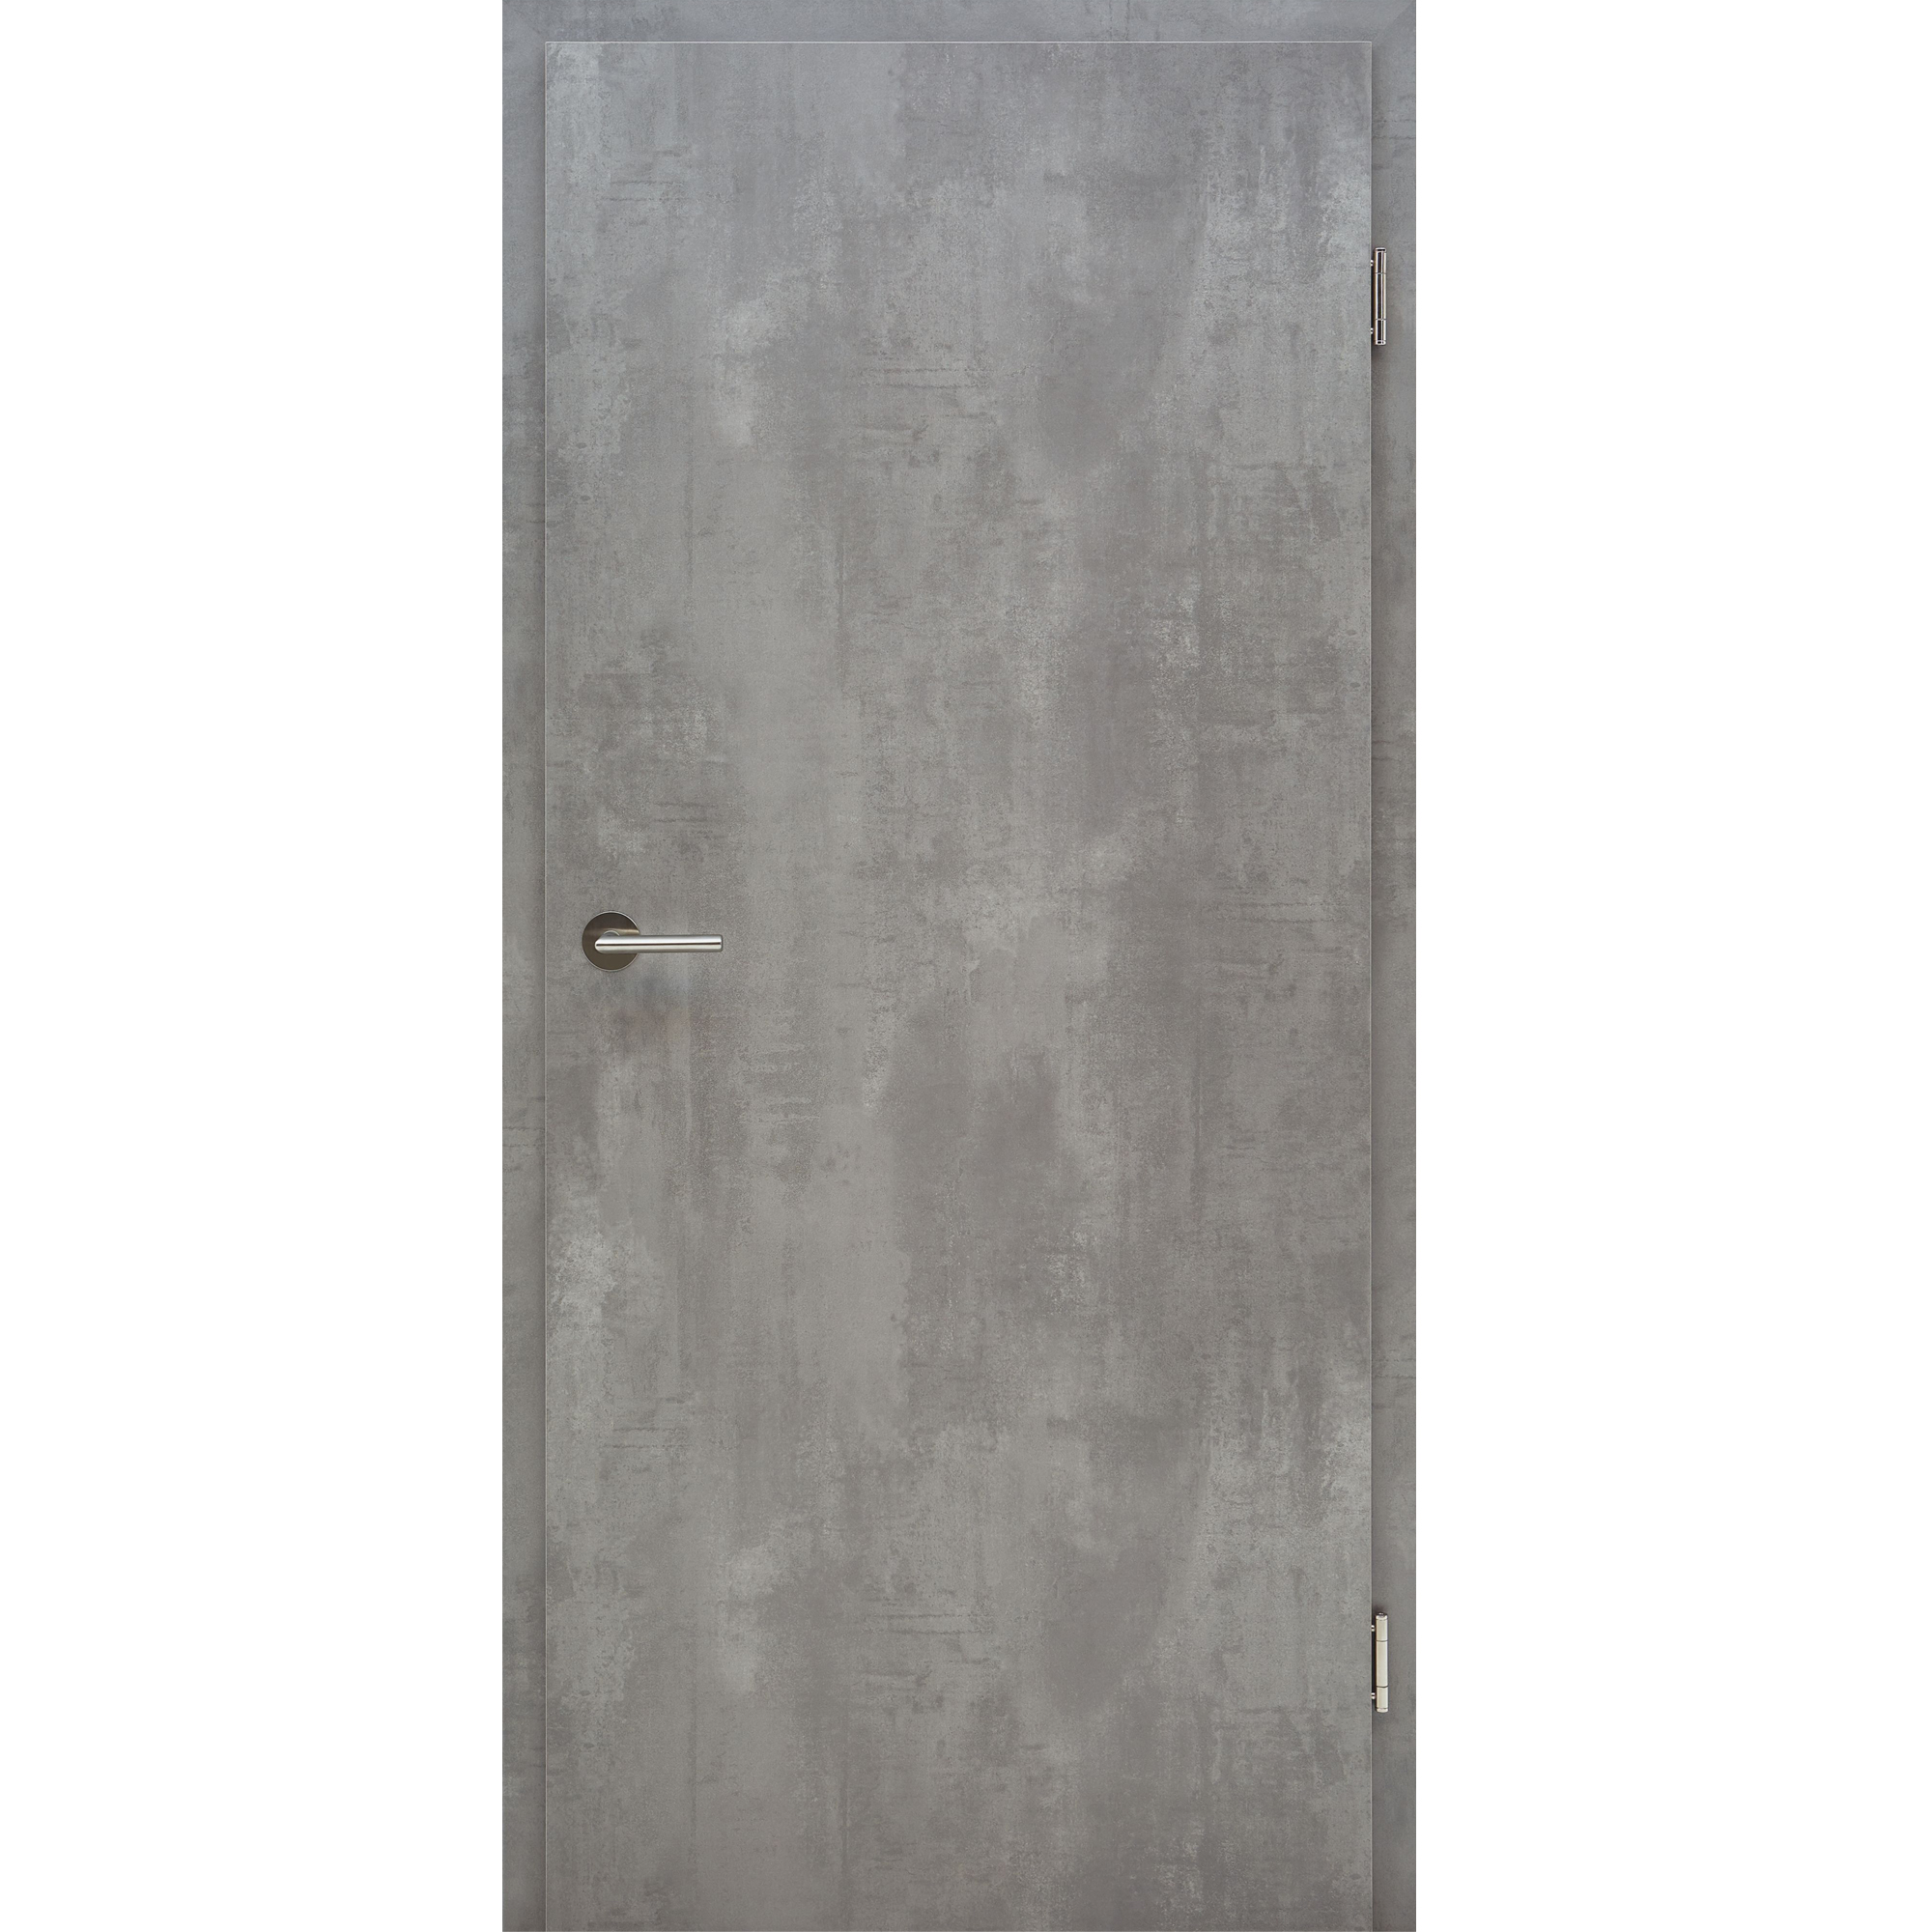 wohnungseingangst r mit zarge cpl concrete vollspan kkl iii 27db eckkante kp holz shop. Black Bedroom Furniture Sets. Home Design Ideas